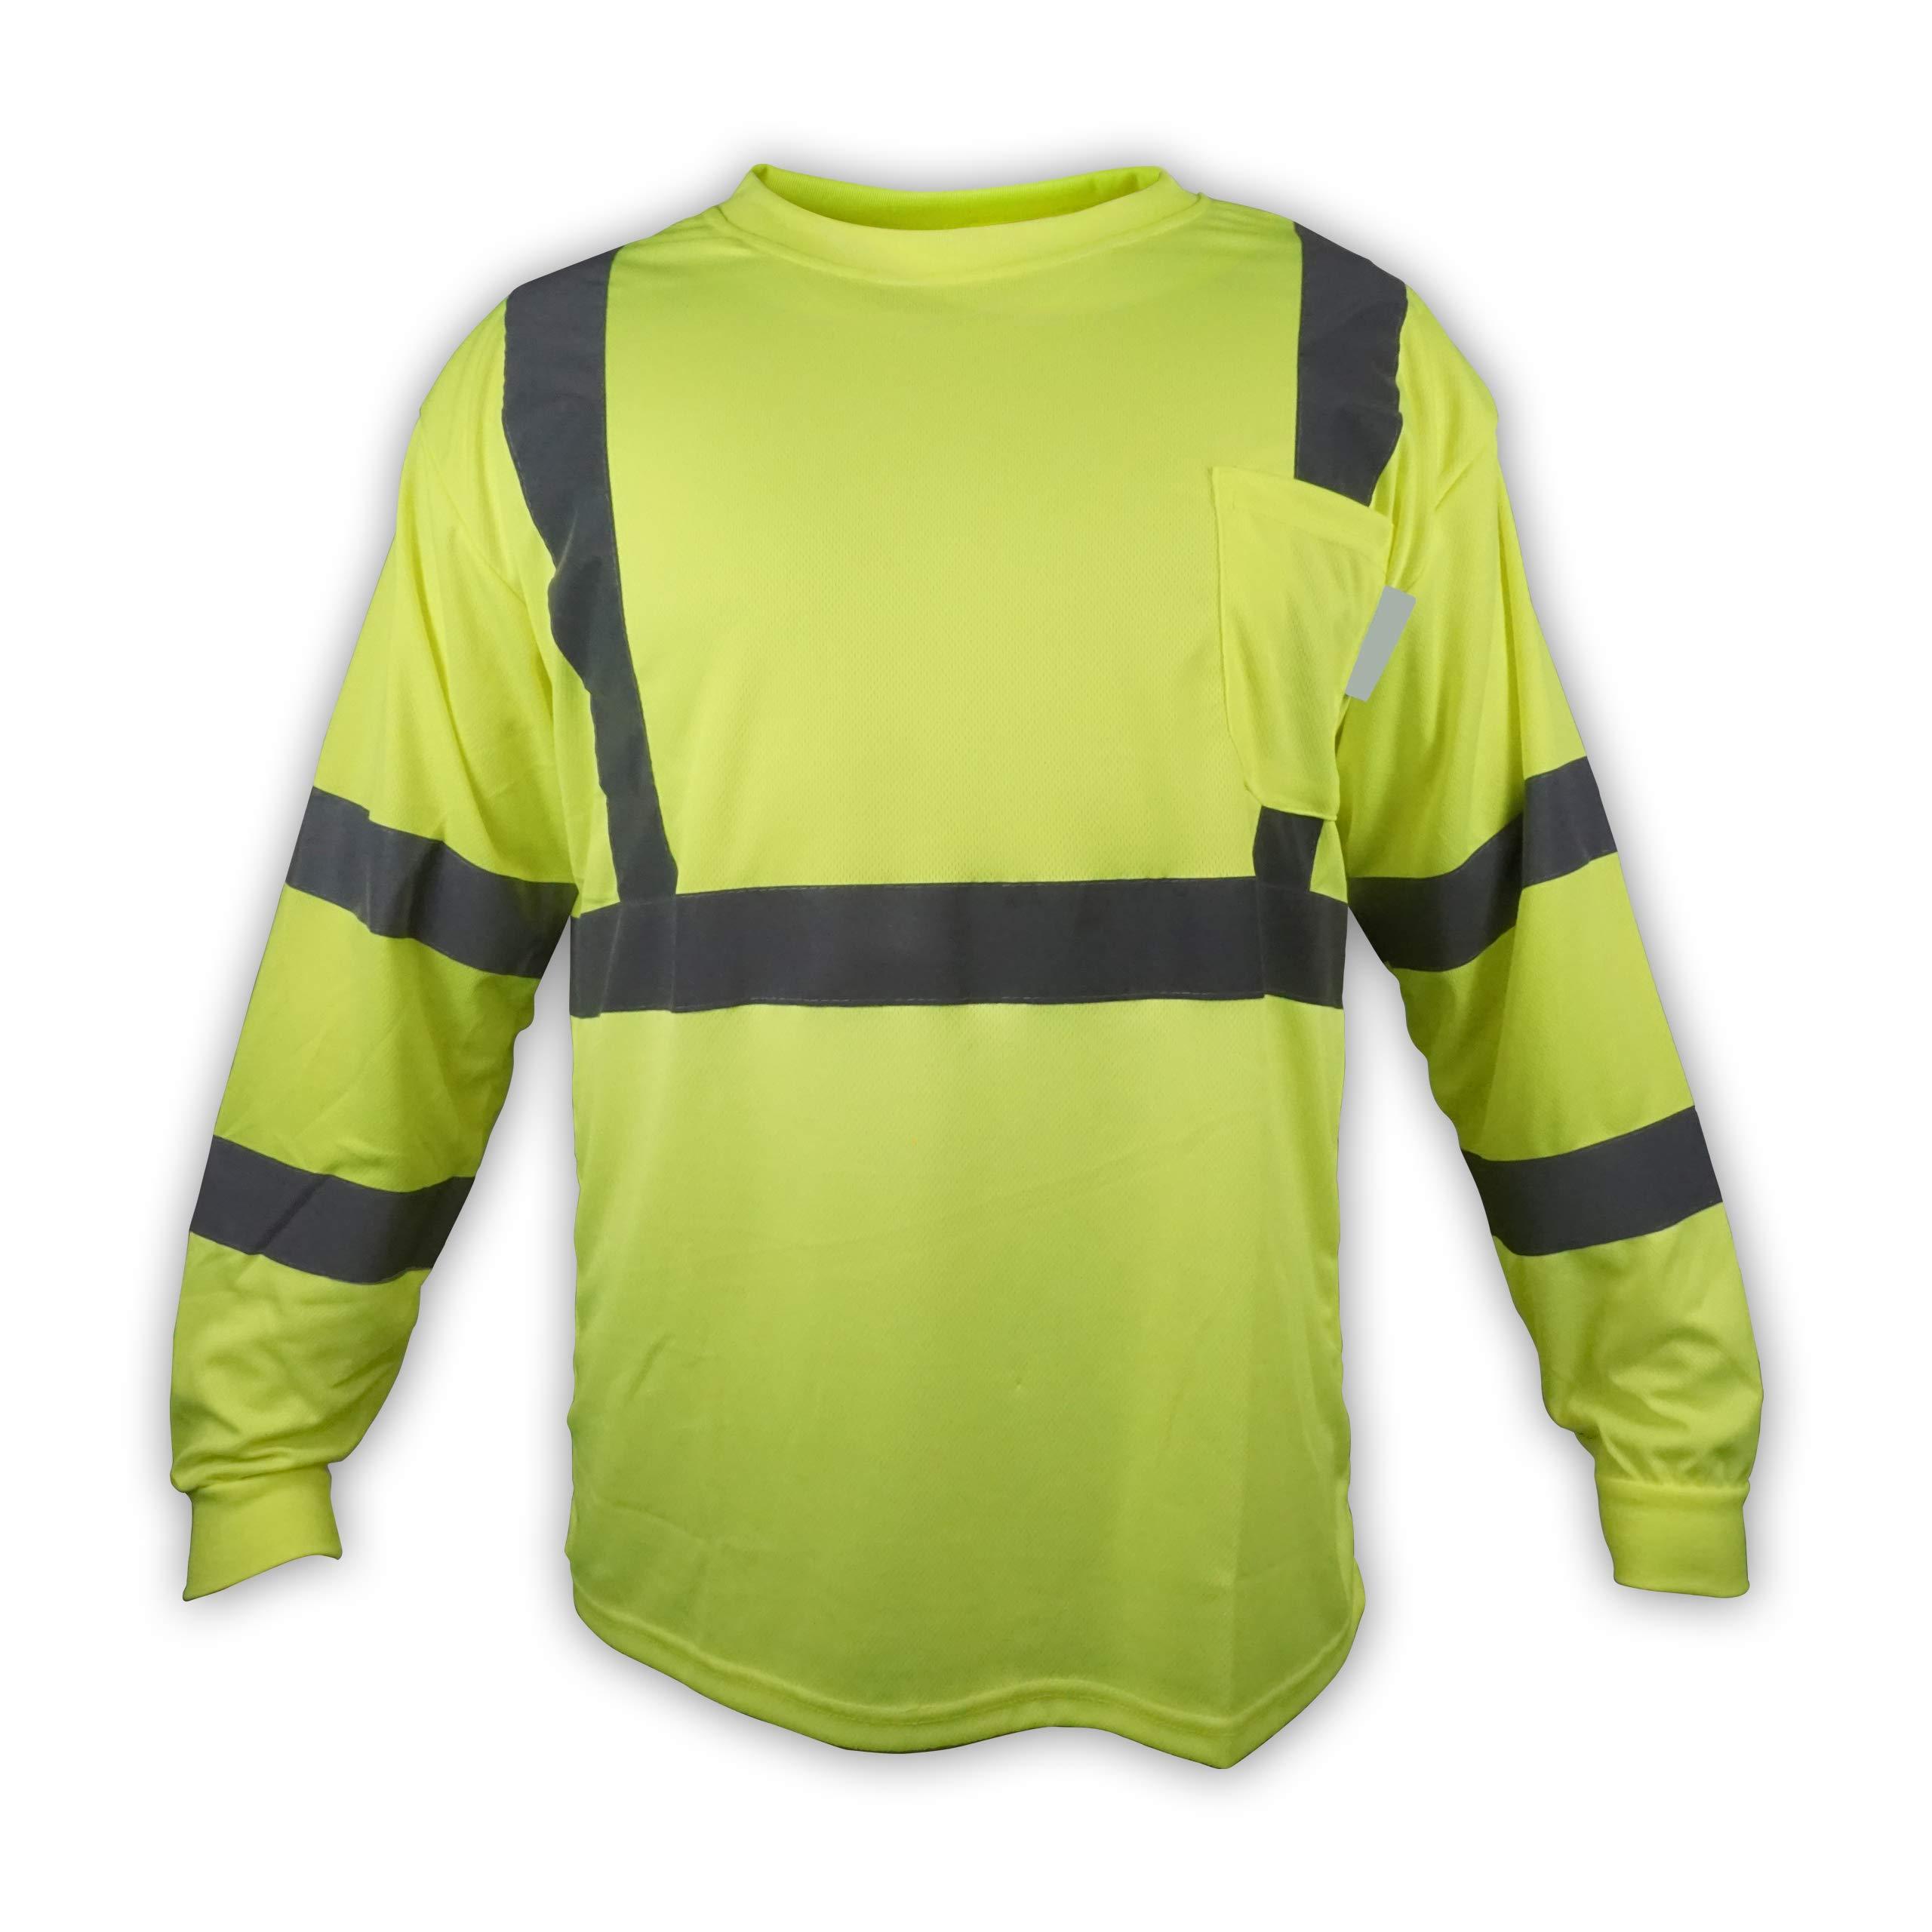 TrueCrest Construction Neon Safety Long Sleeve High Visibility T Shirt, XL